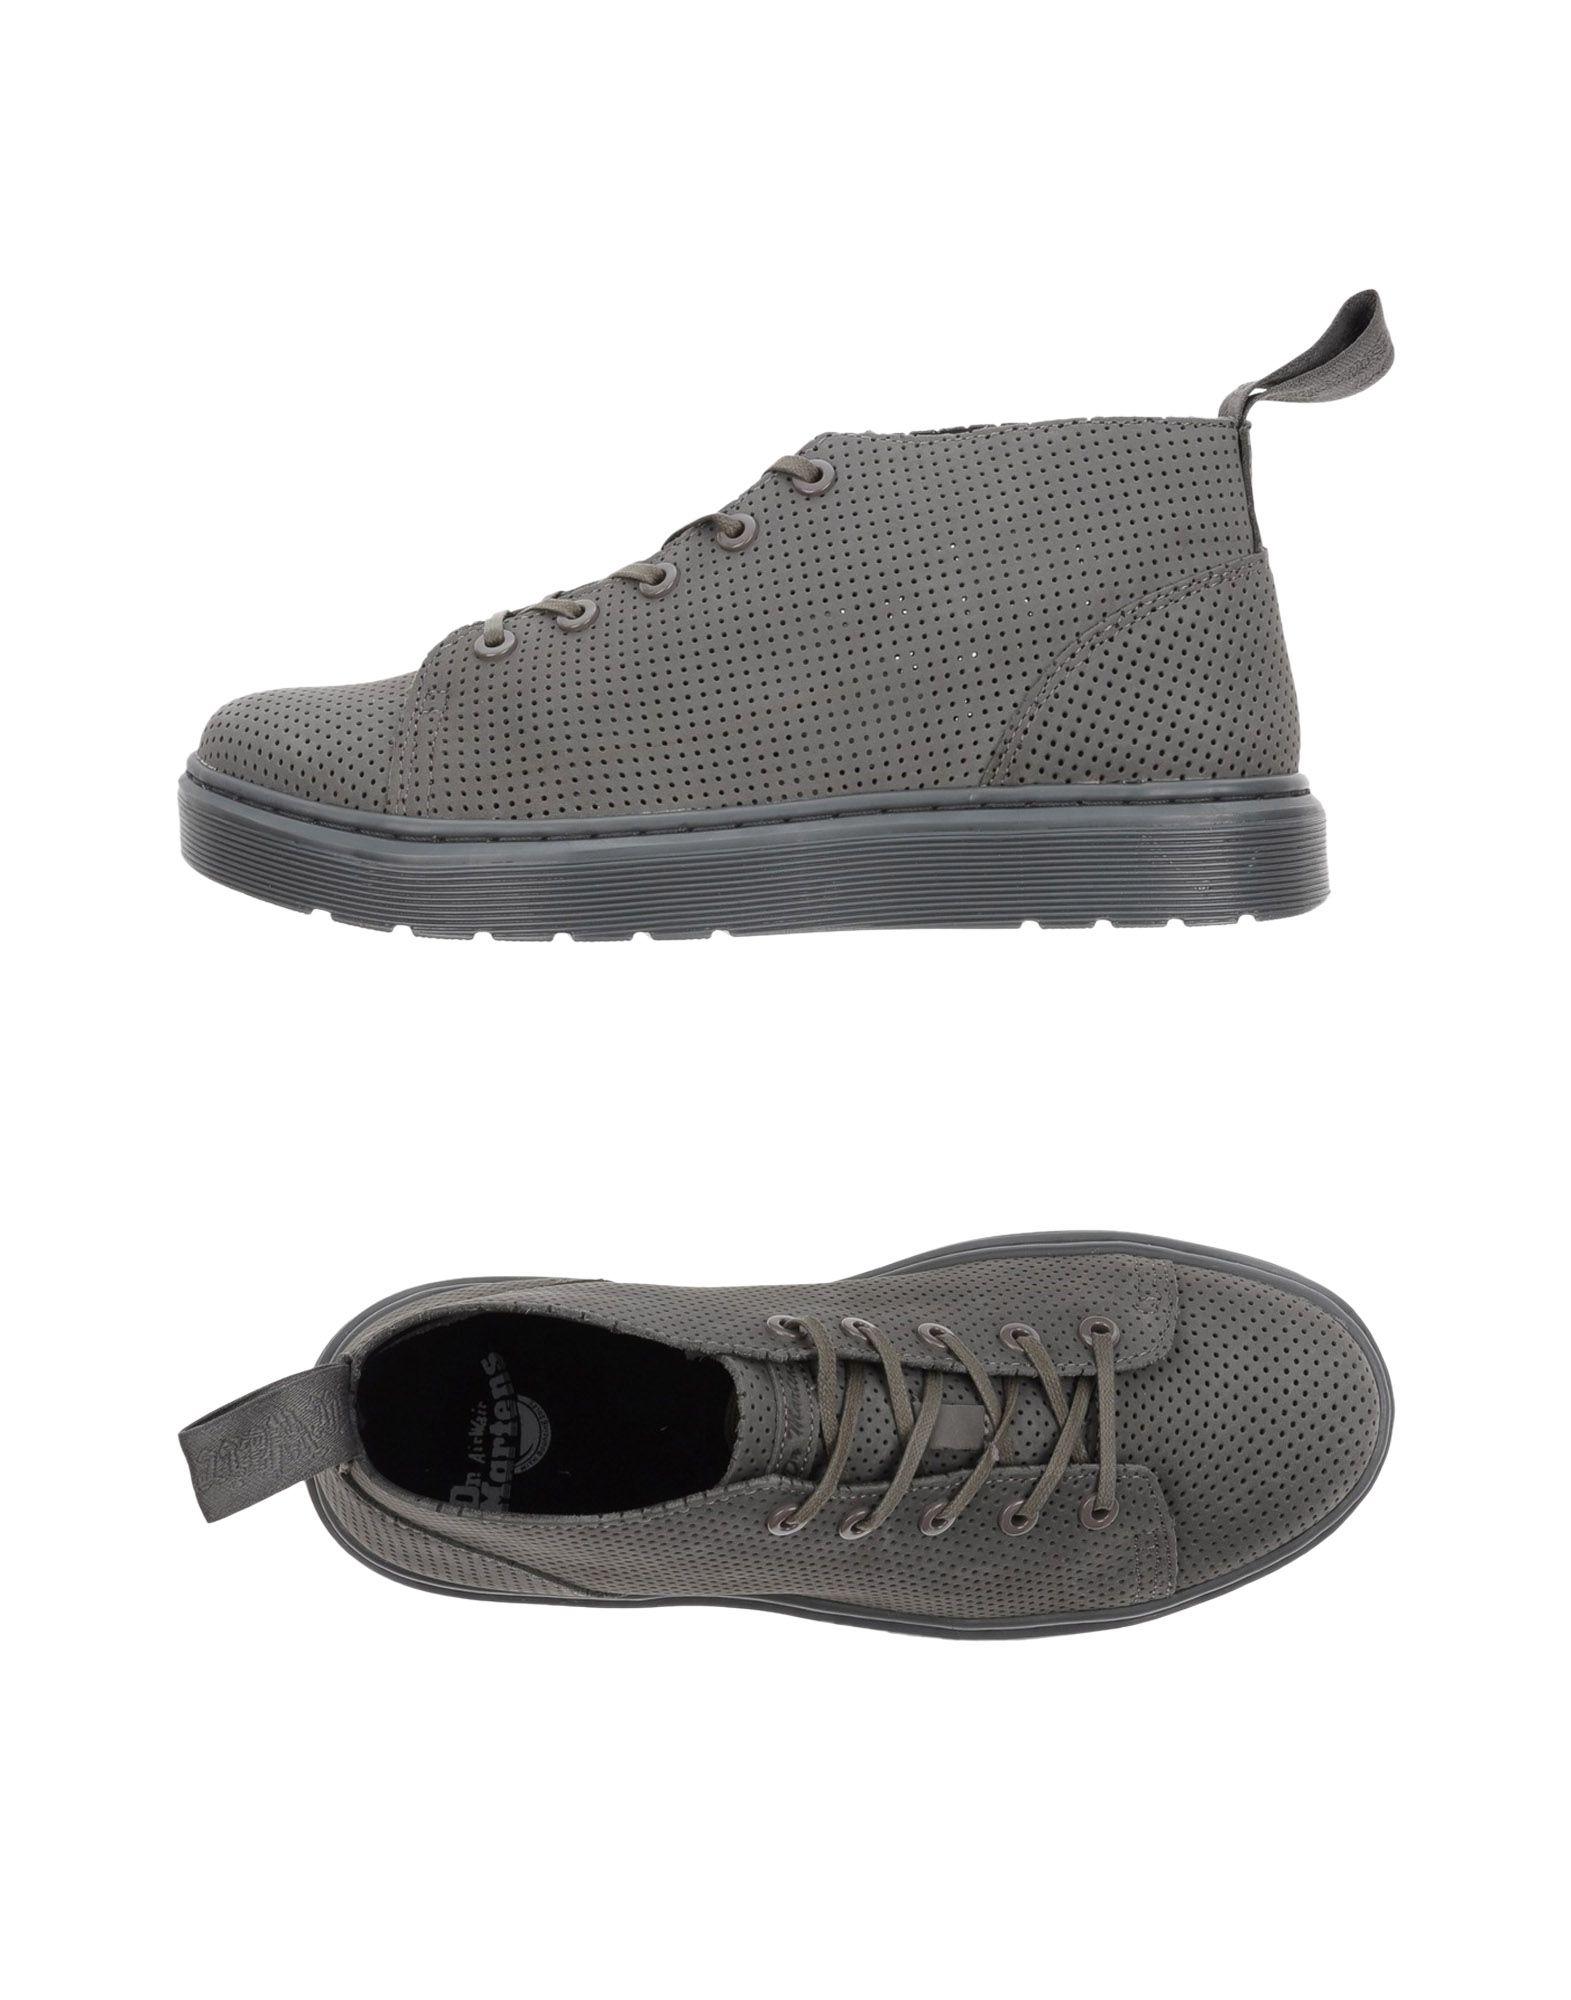 Sneakers Dr. Martens Homme - Sneakers Dr. Martens sur